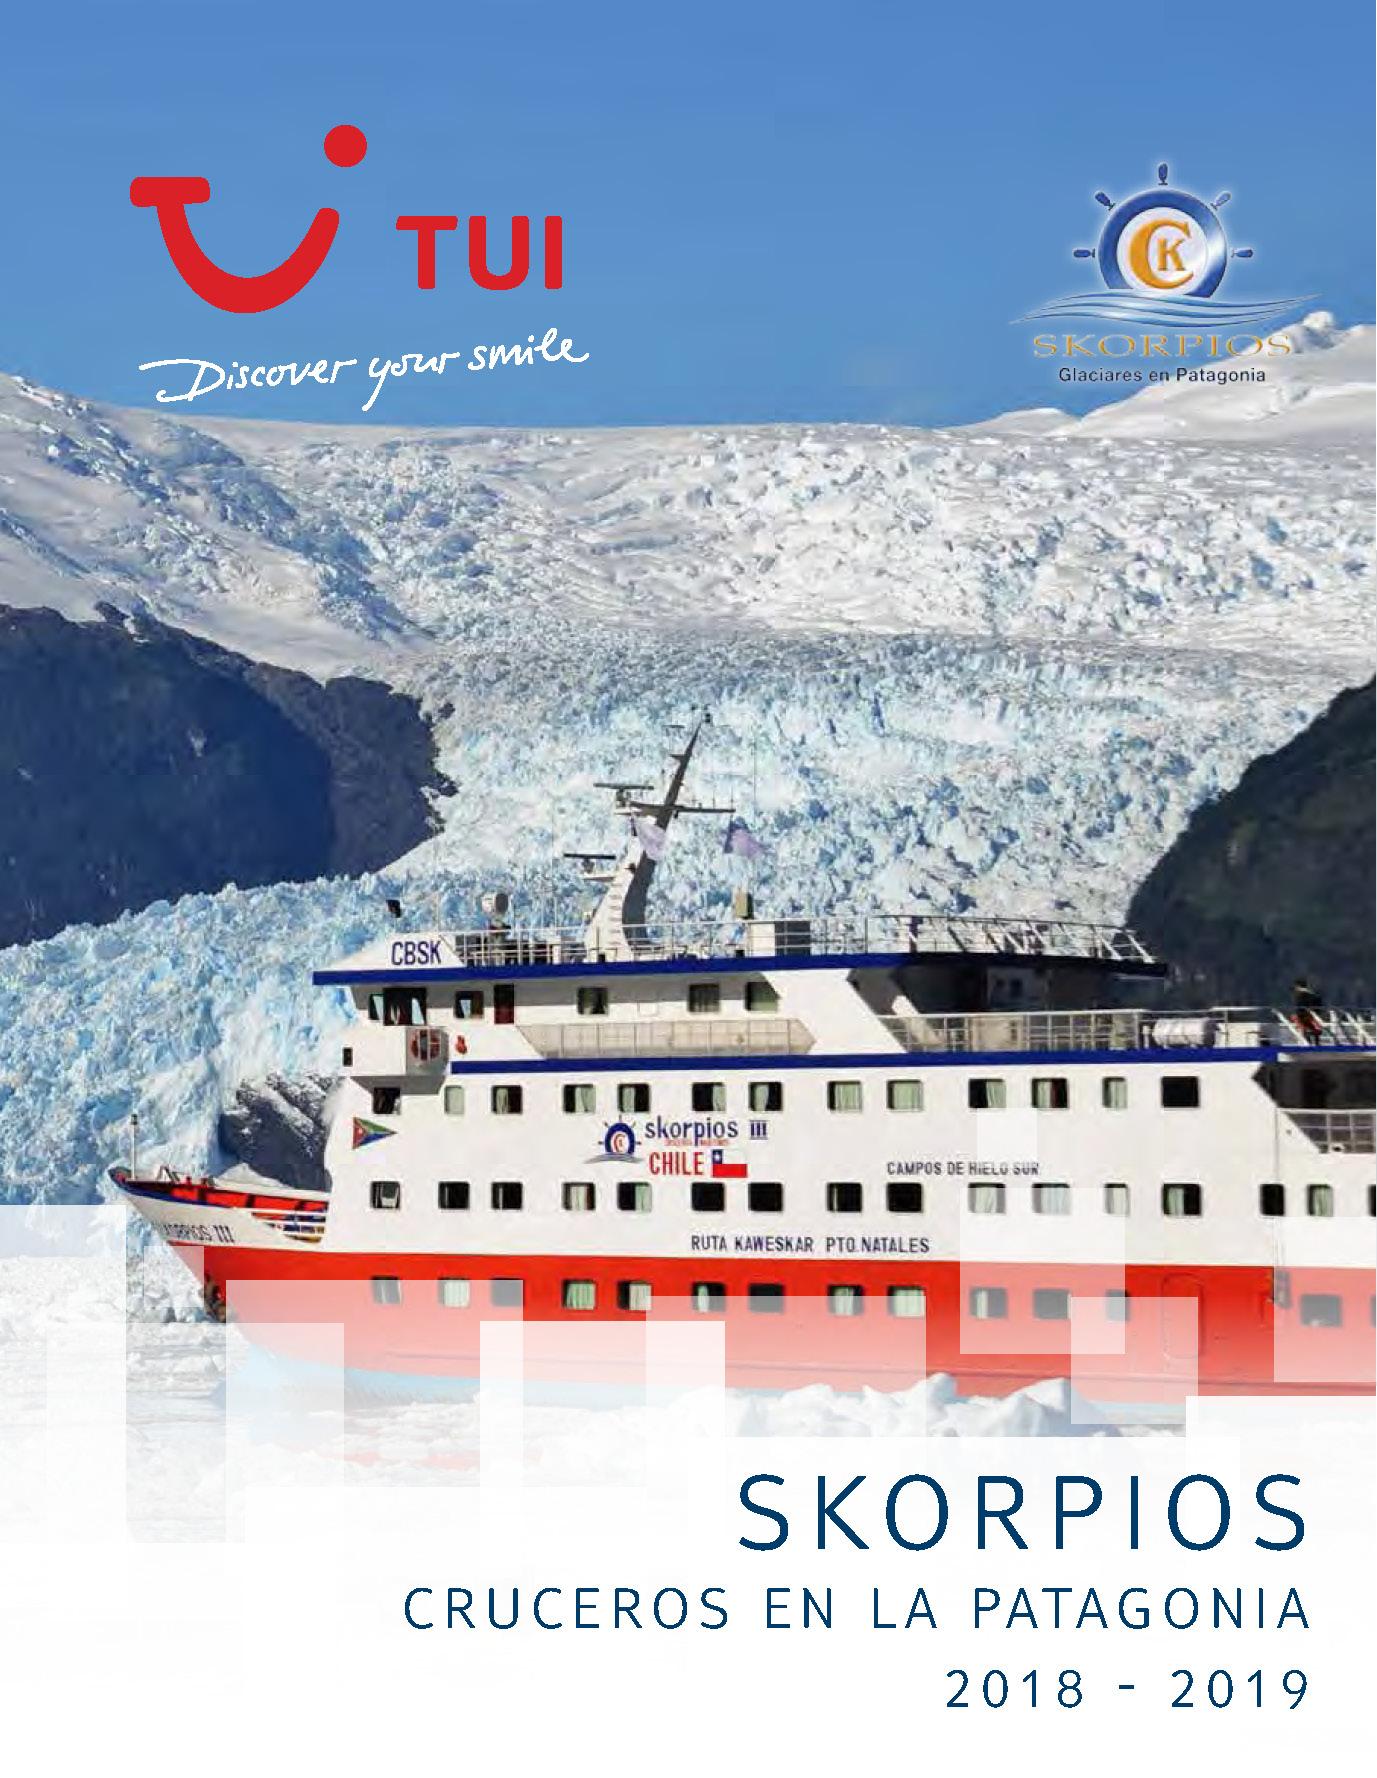 Catalogo TUI Ambassador Tours Cruceros Skorpios 2018-2019